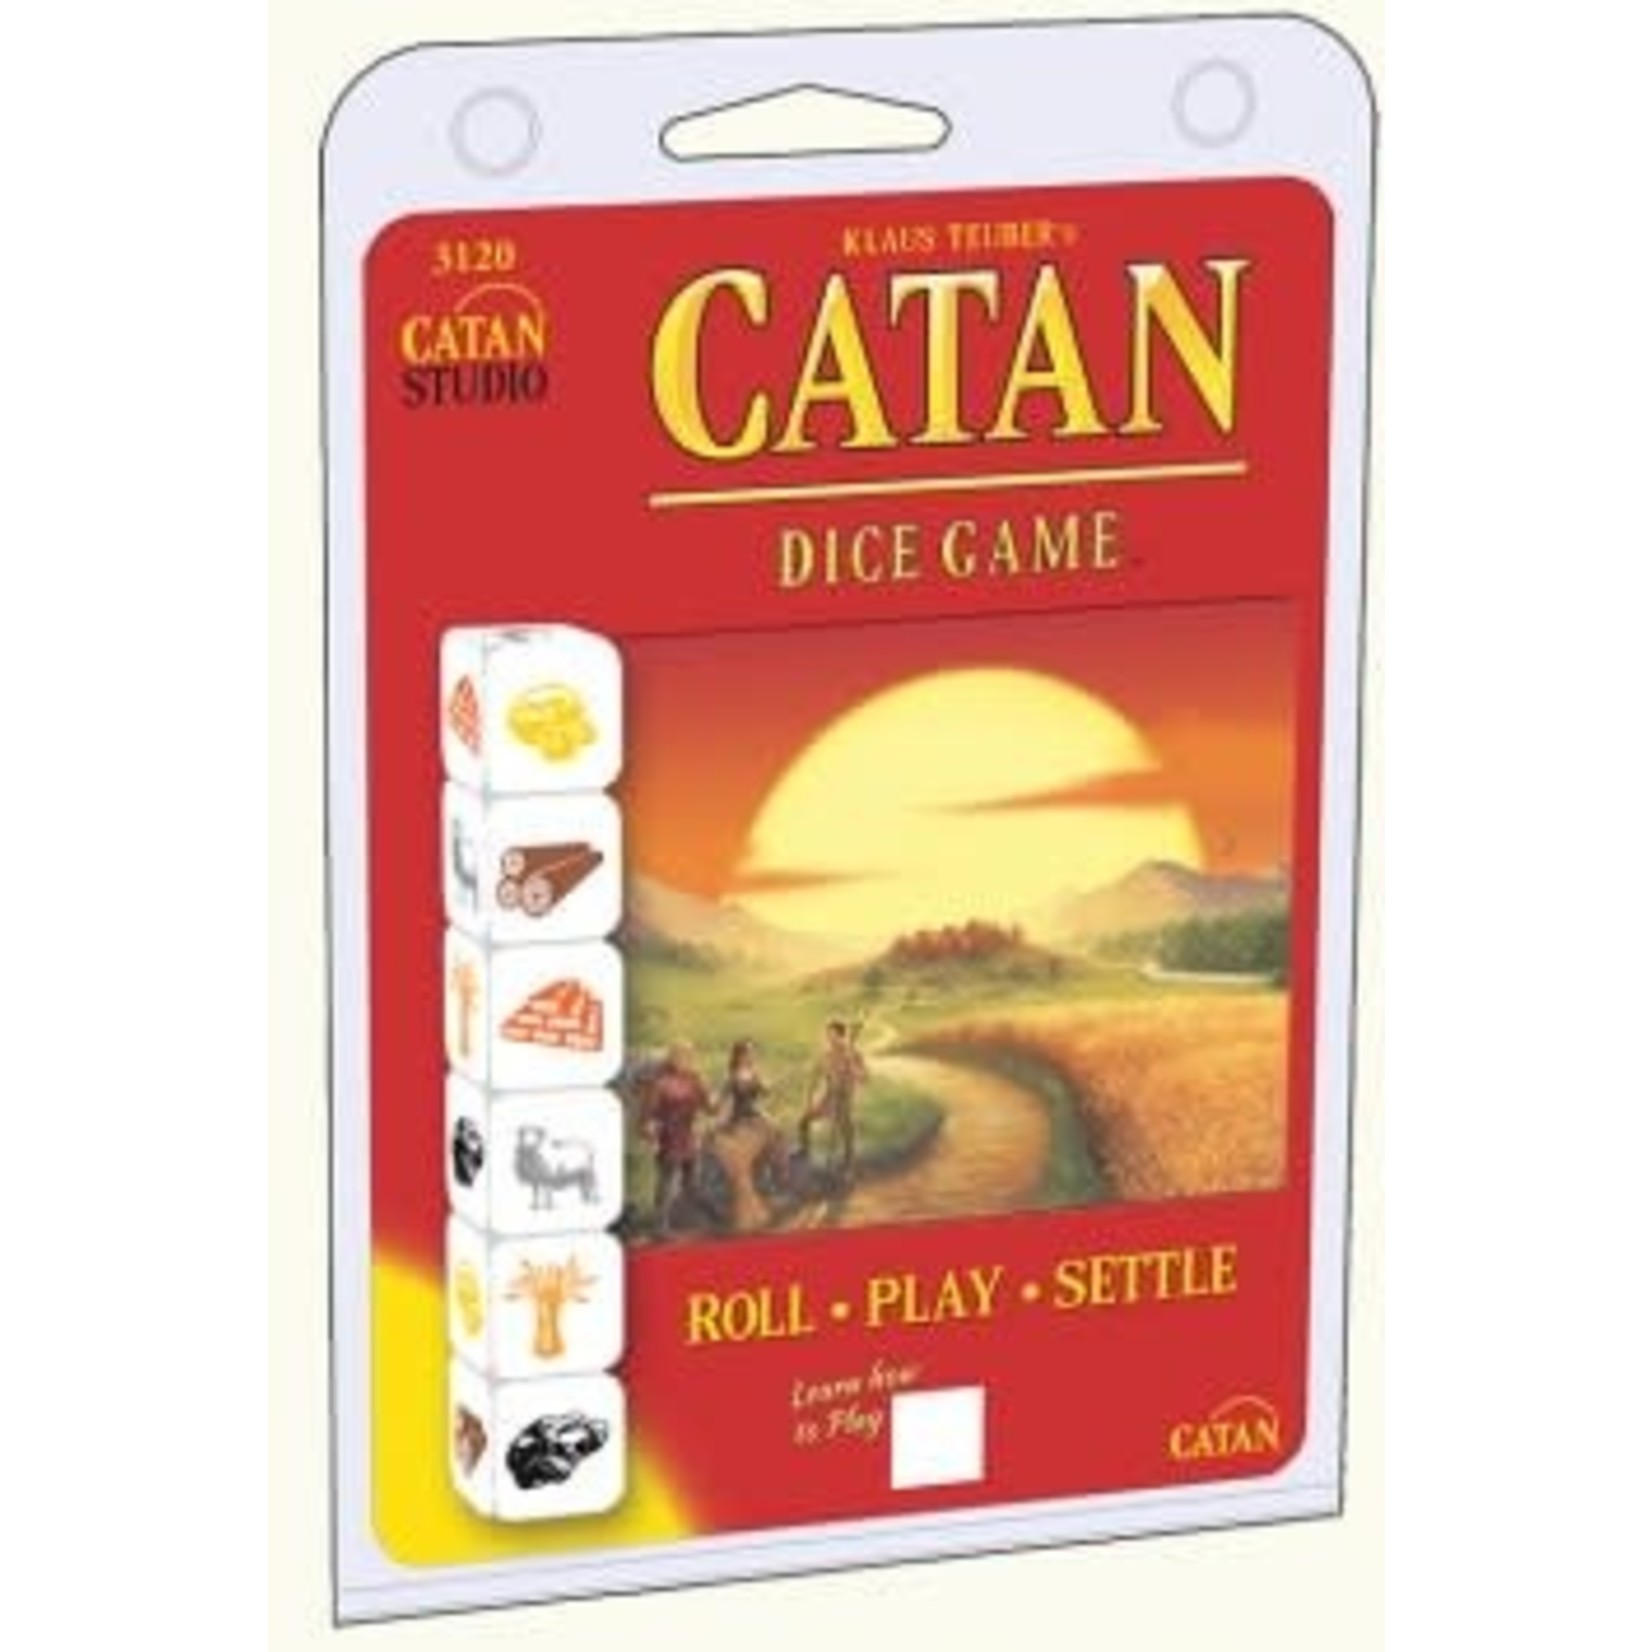 Catan Studio Catan Dice Game